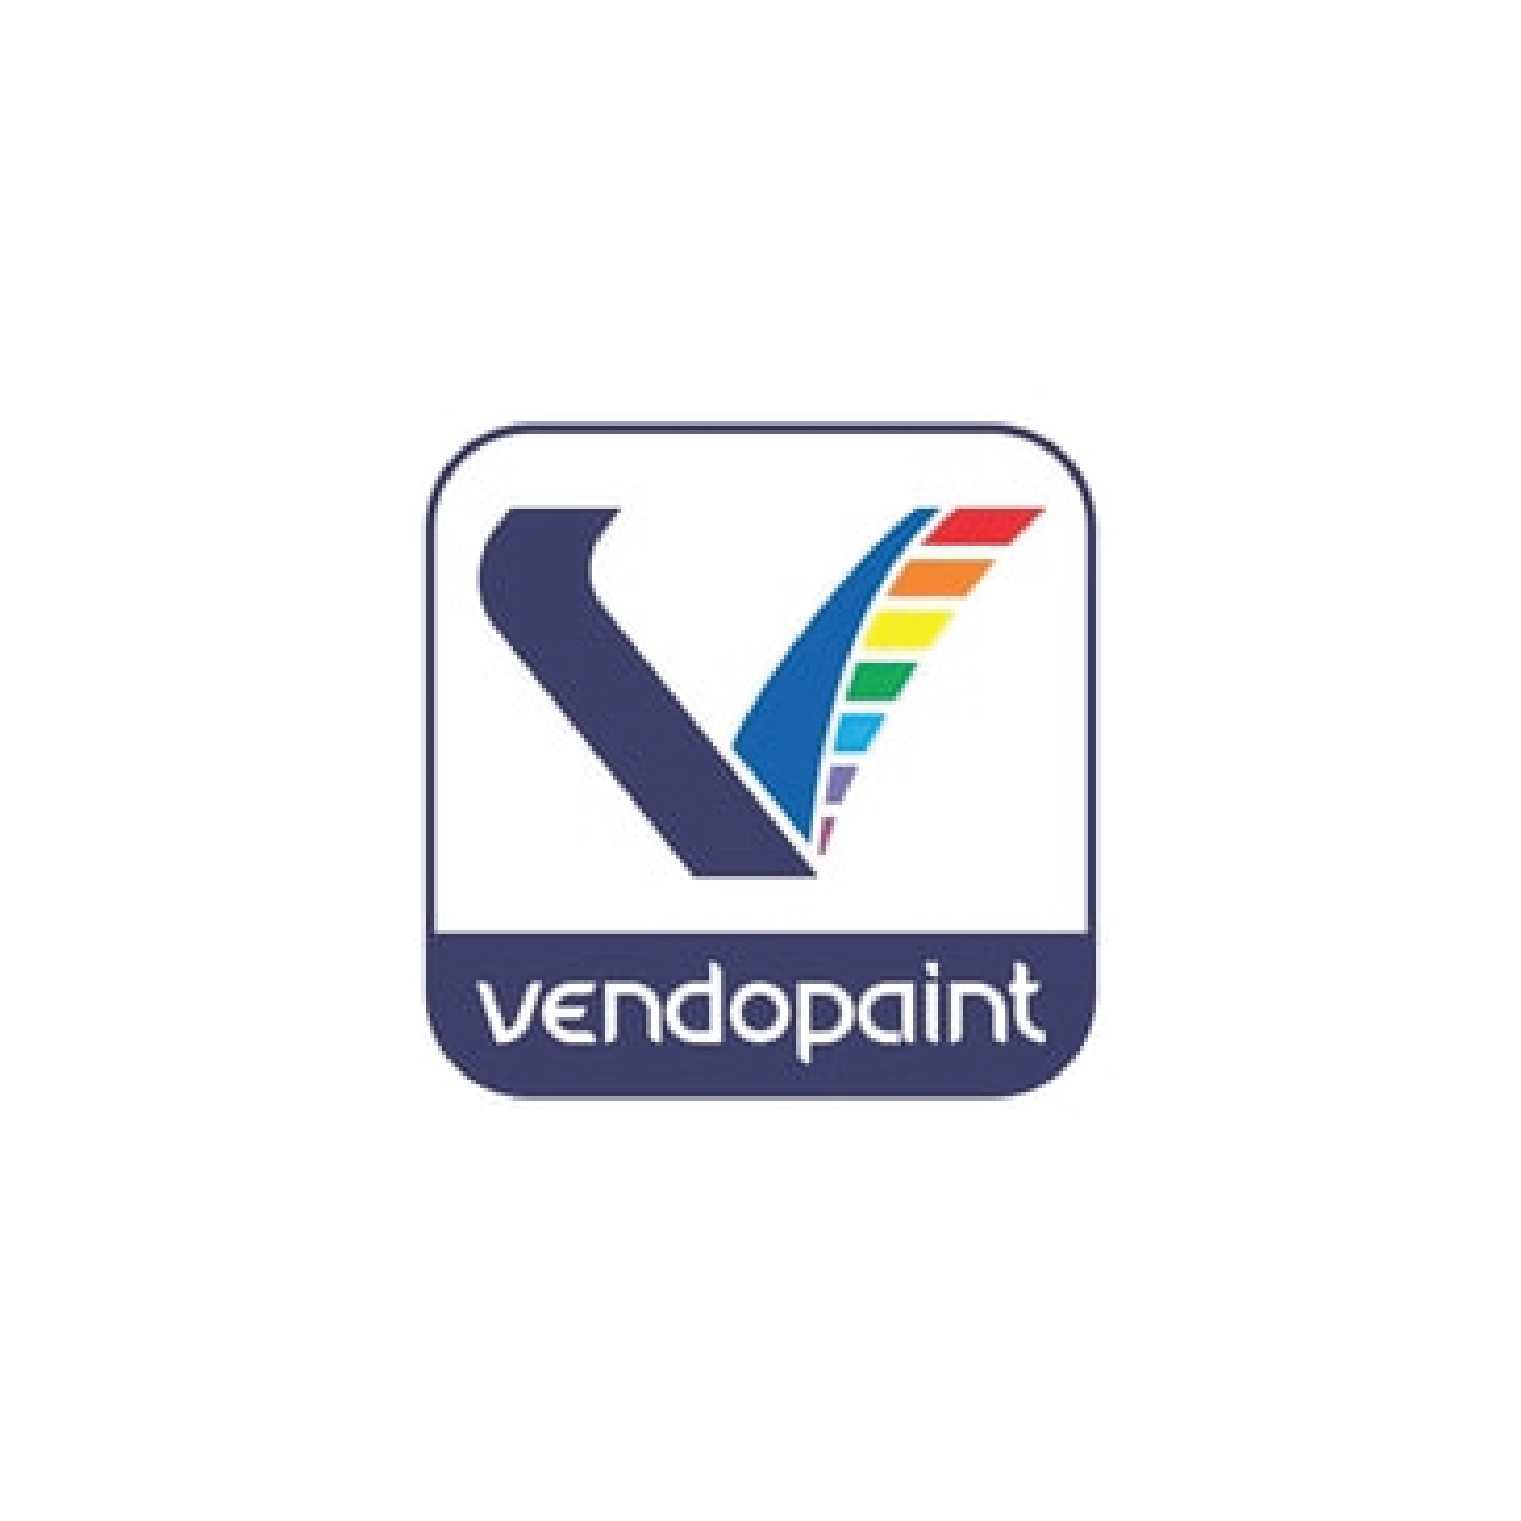 Vendopaint